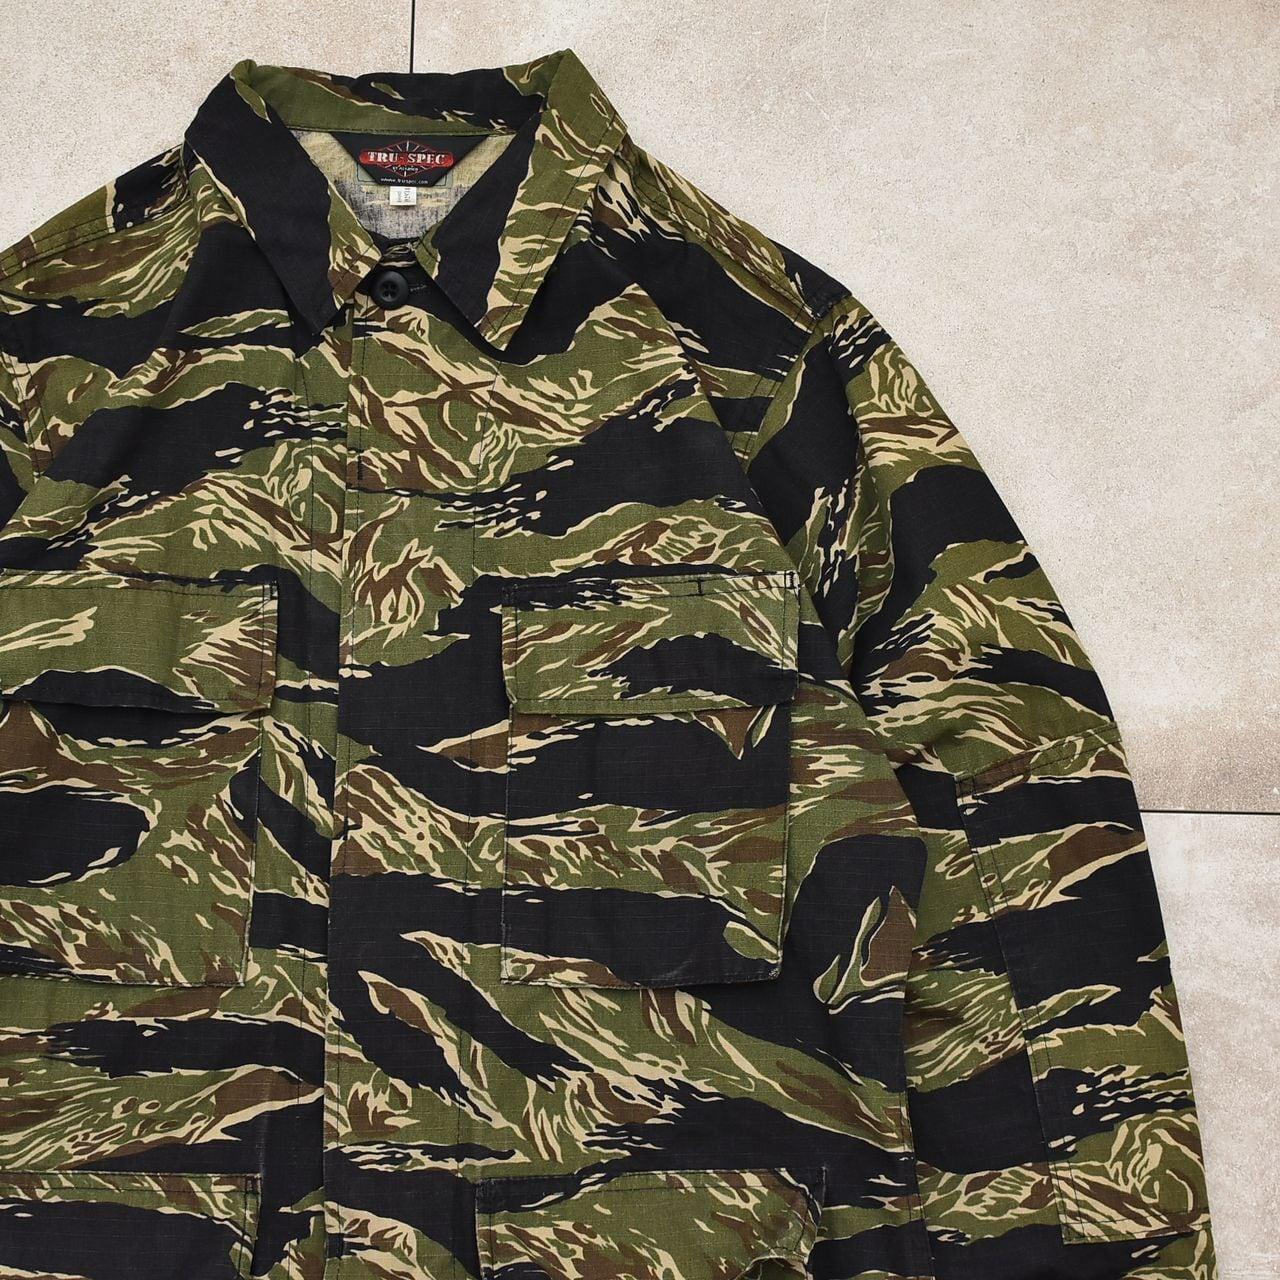 TRU-SPEC tiger stripe camo combat jacket